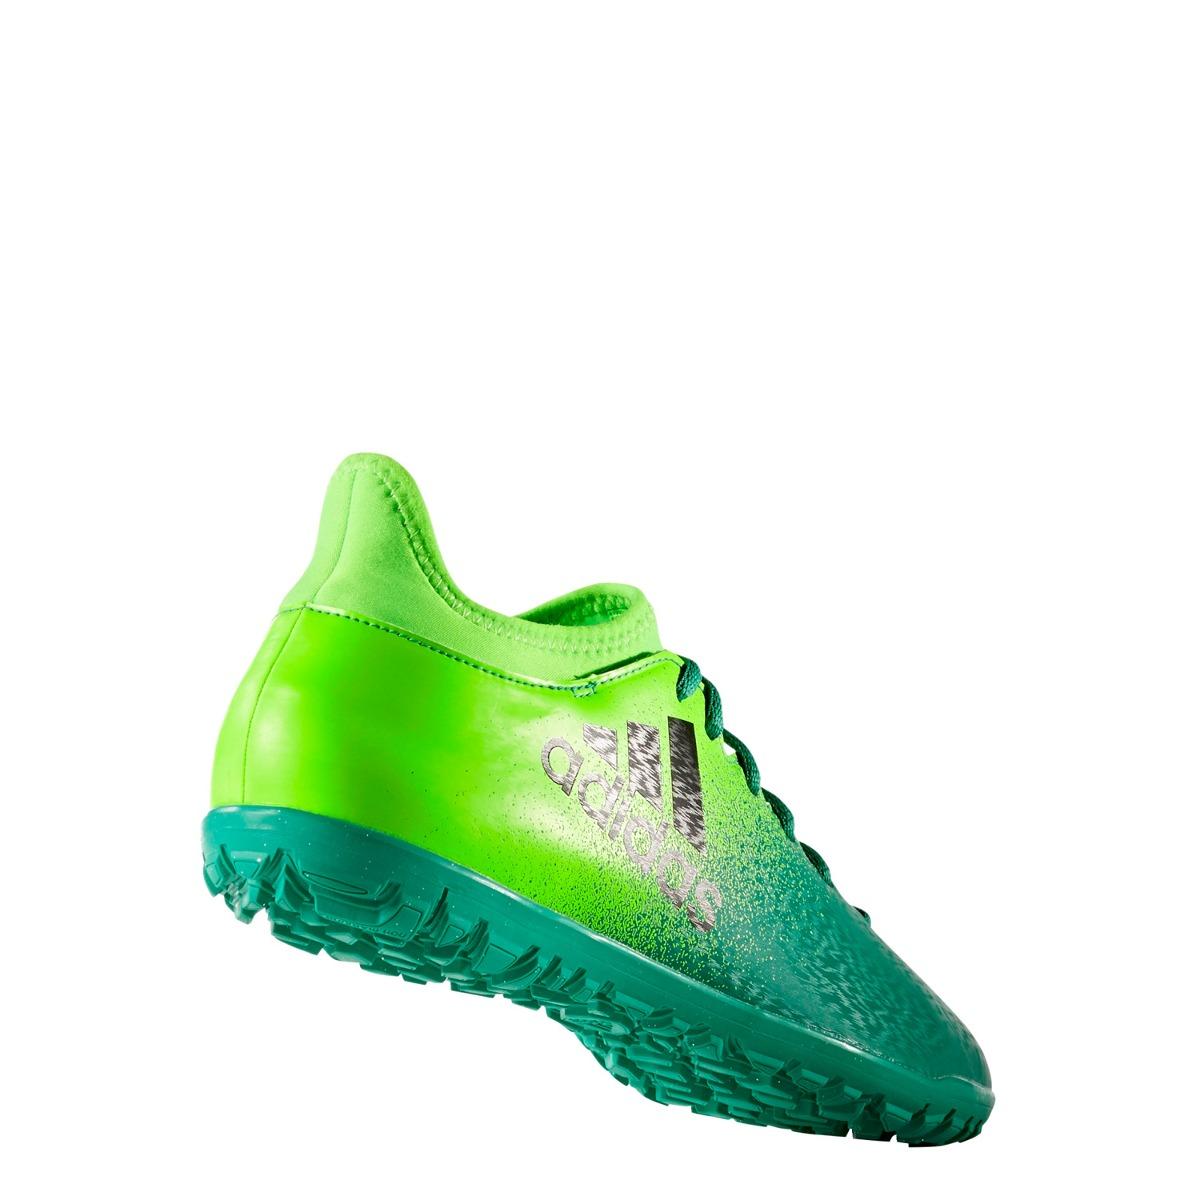 Botines Adidas X 16.3 Tf Open Sports